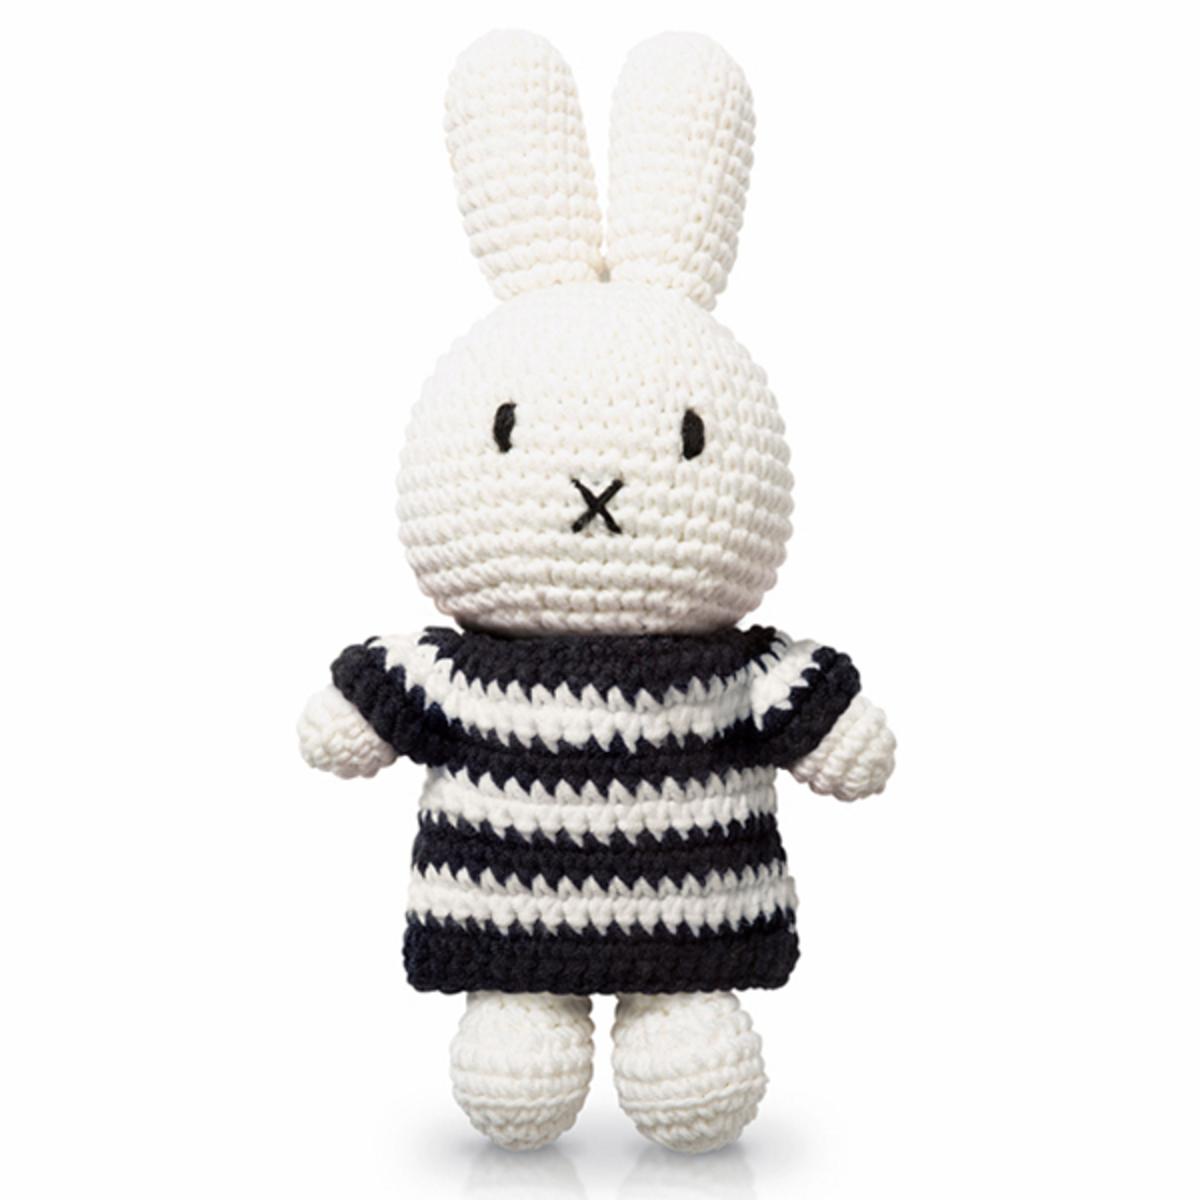 Peluche Miffy Rayures Noires et Blanches - Moyen Peluche Lapin Miffy Rayures Noires et Blanches 25 cm